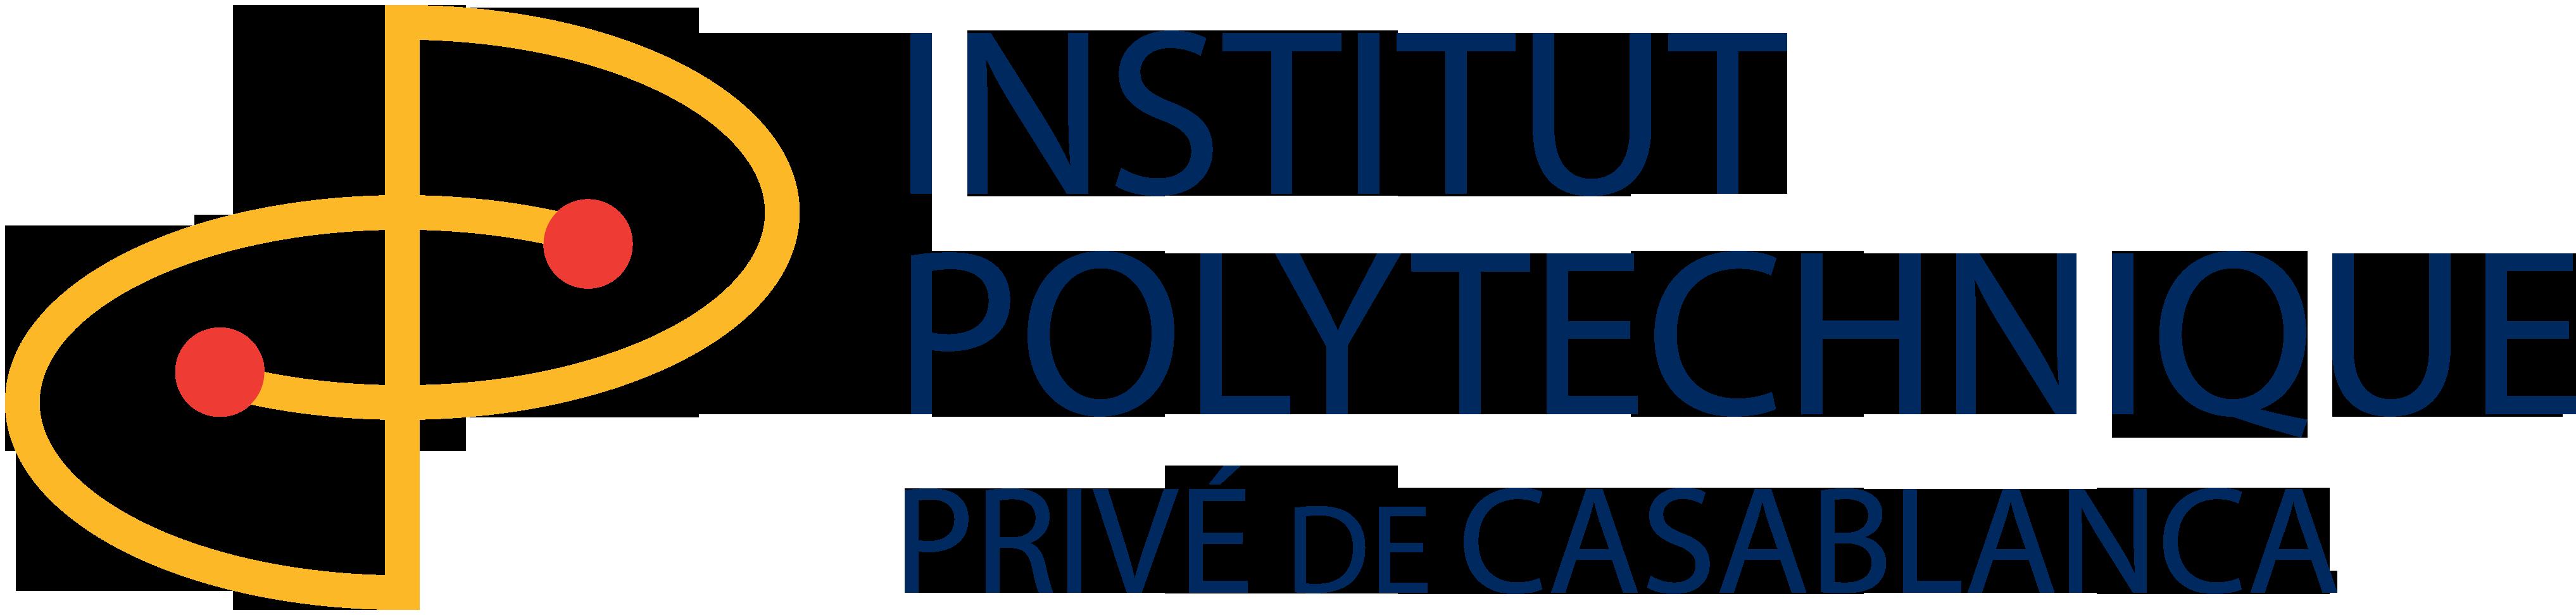 Institut Polytechnique Privé de Casablanca